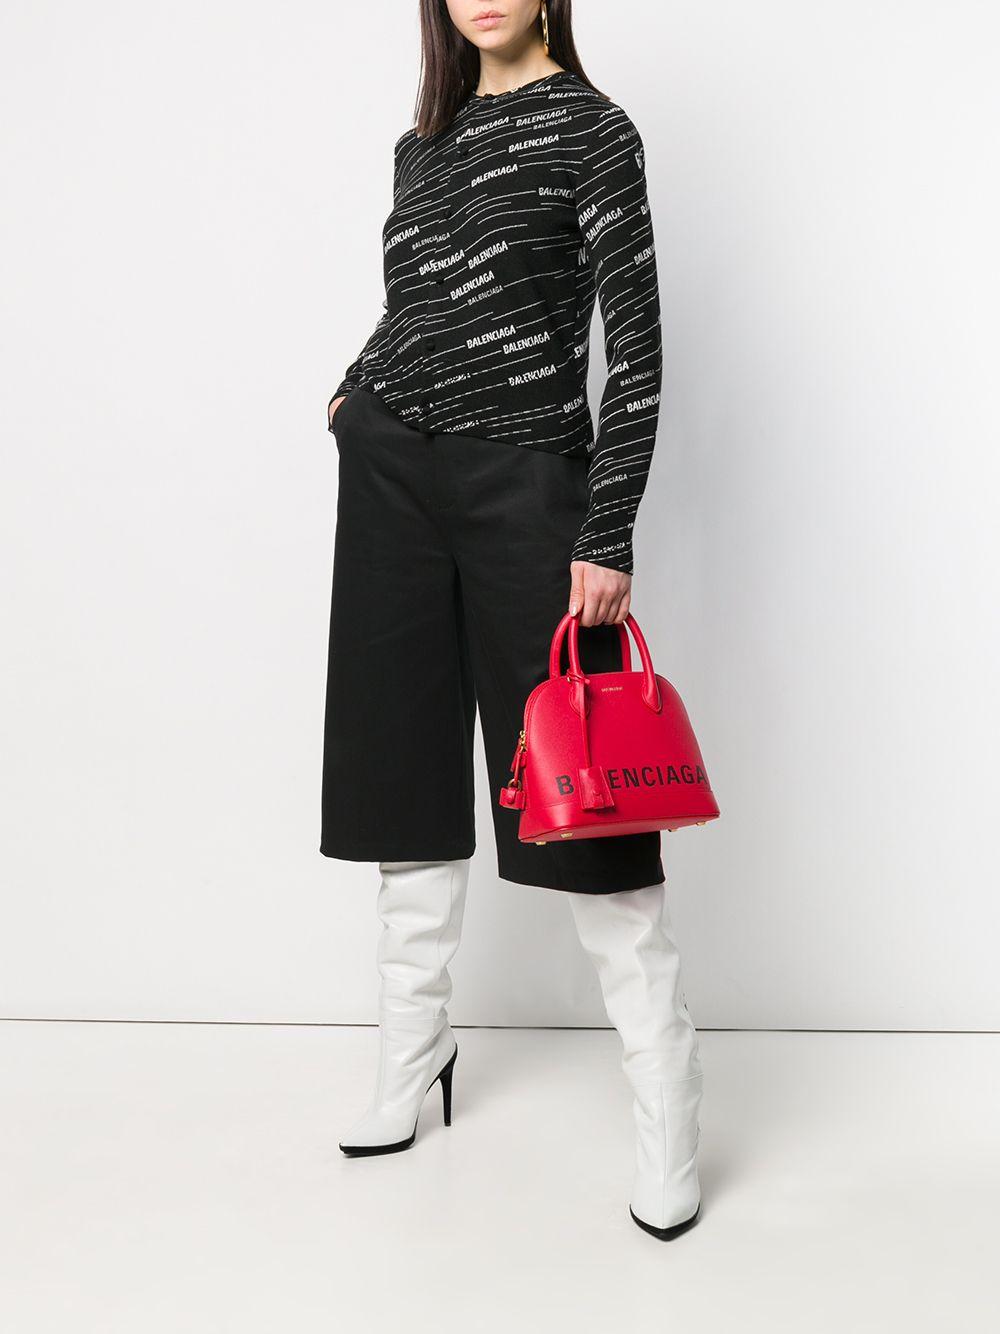 soft wool and virgin wool black and white cardigan  BALENCIAGA |  | 555294-T15241070